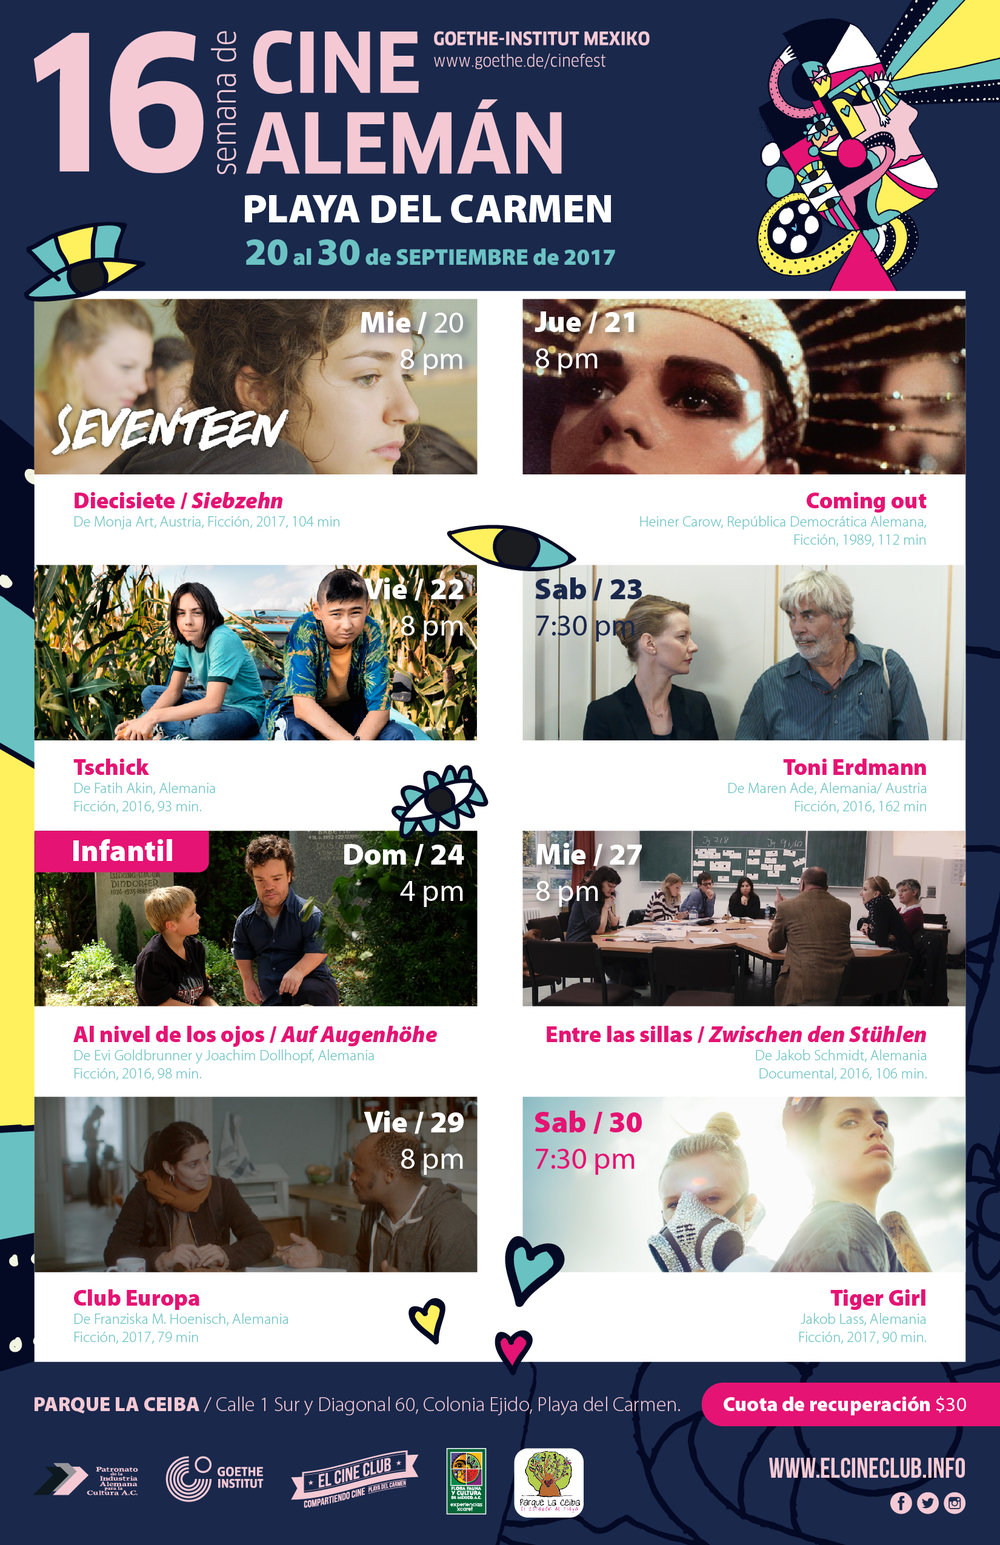 poster_programa_cine_alemán-04.jpg